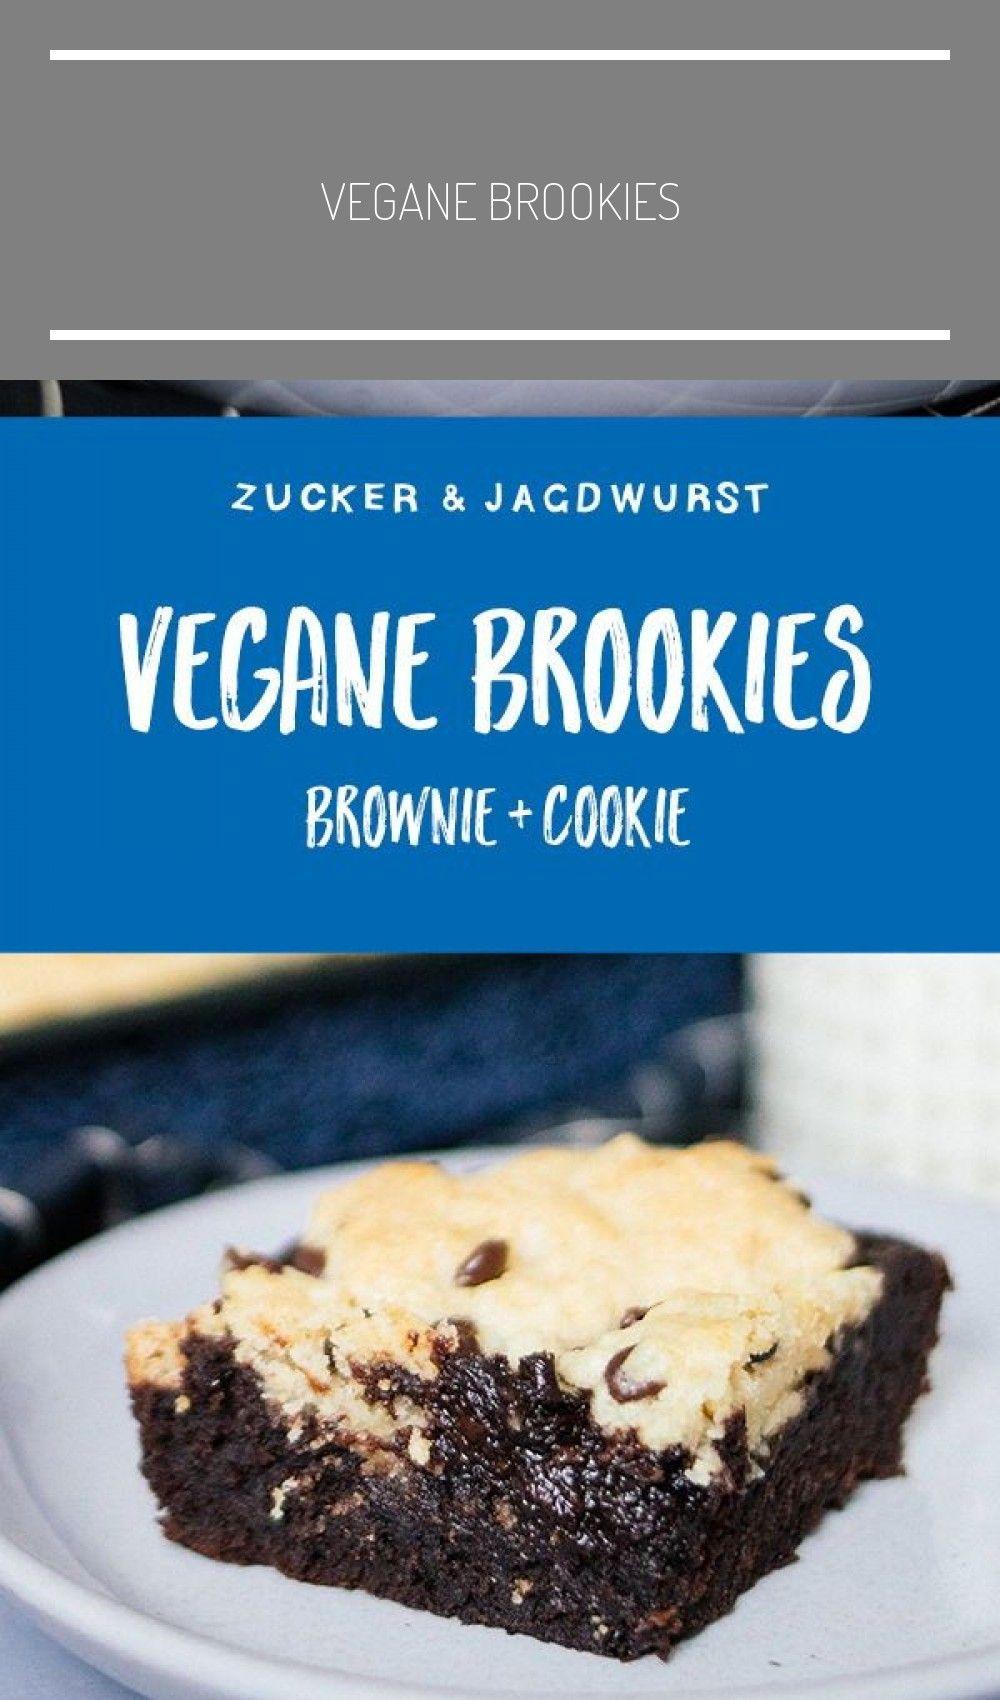 Vegane Brookies selber backen rezept schnell vegan Vegane Brookies